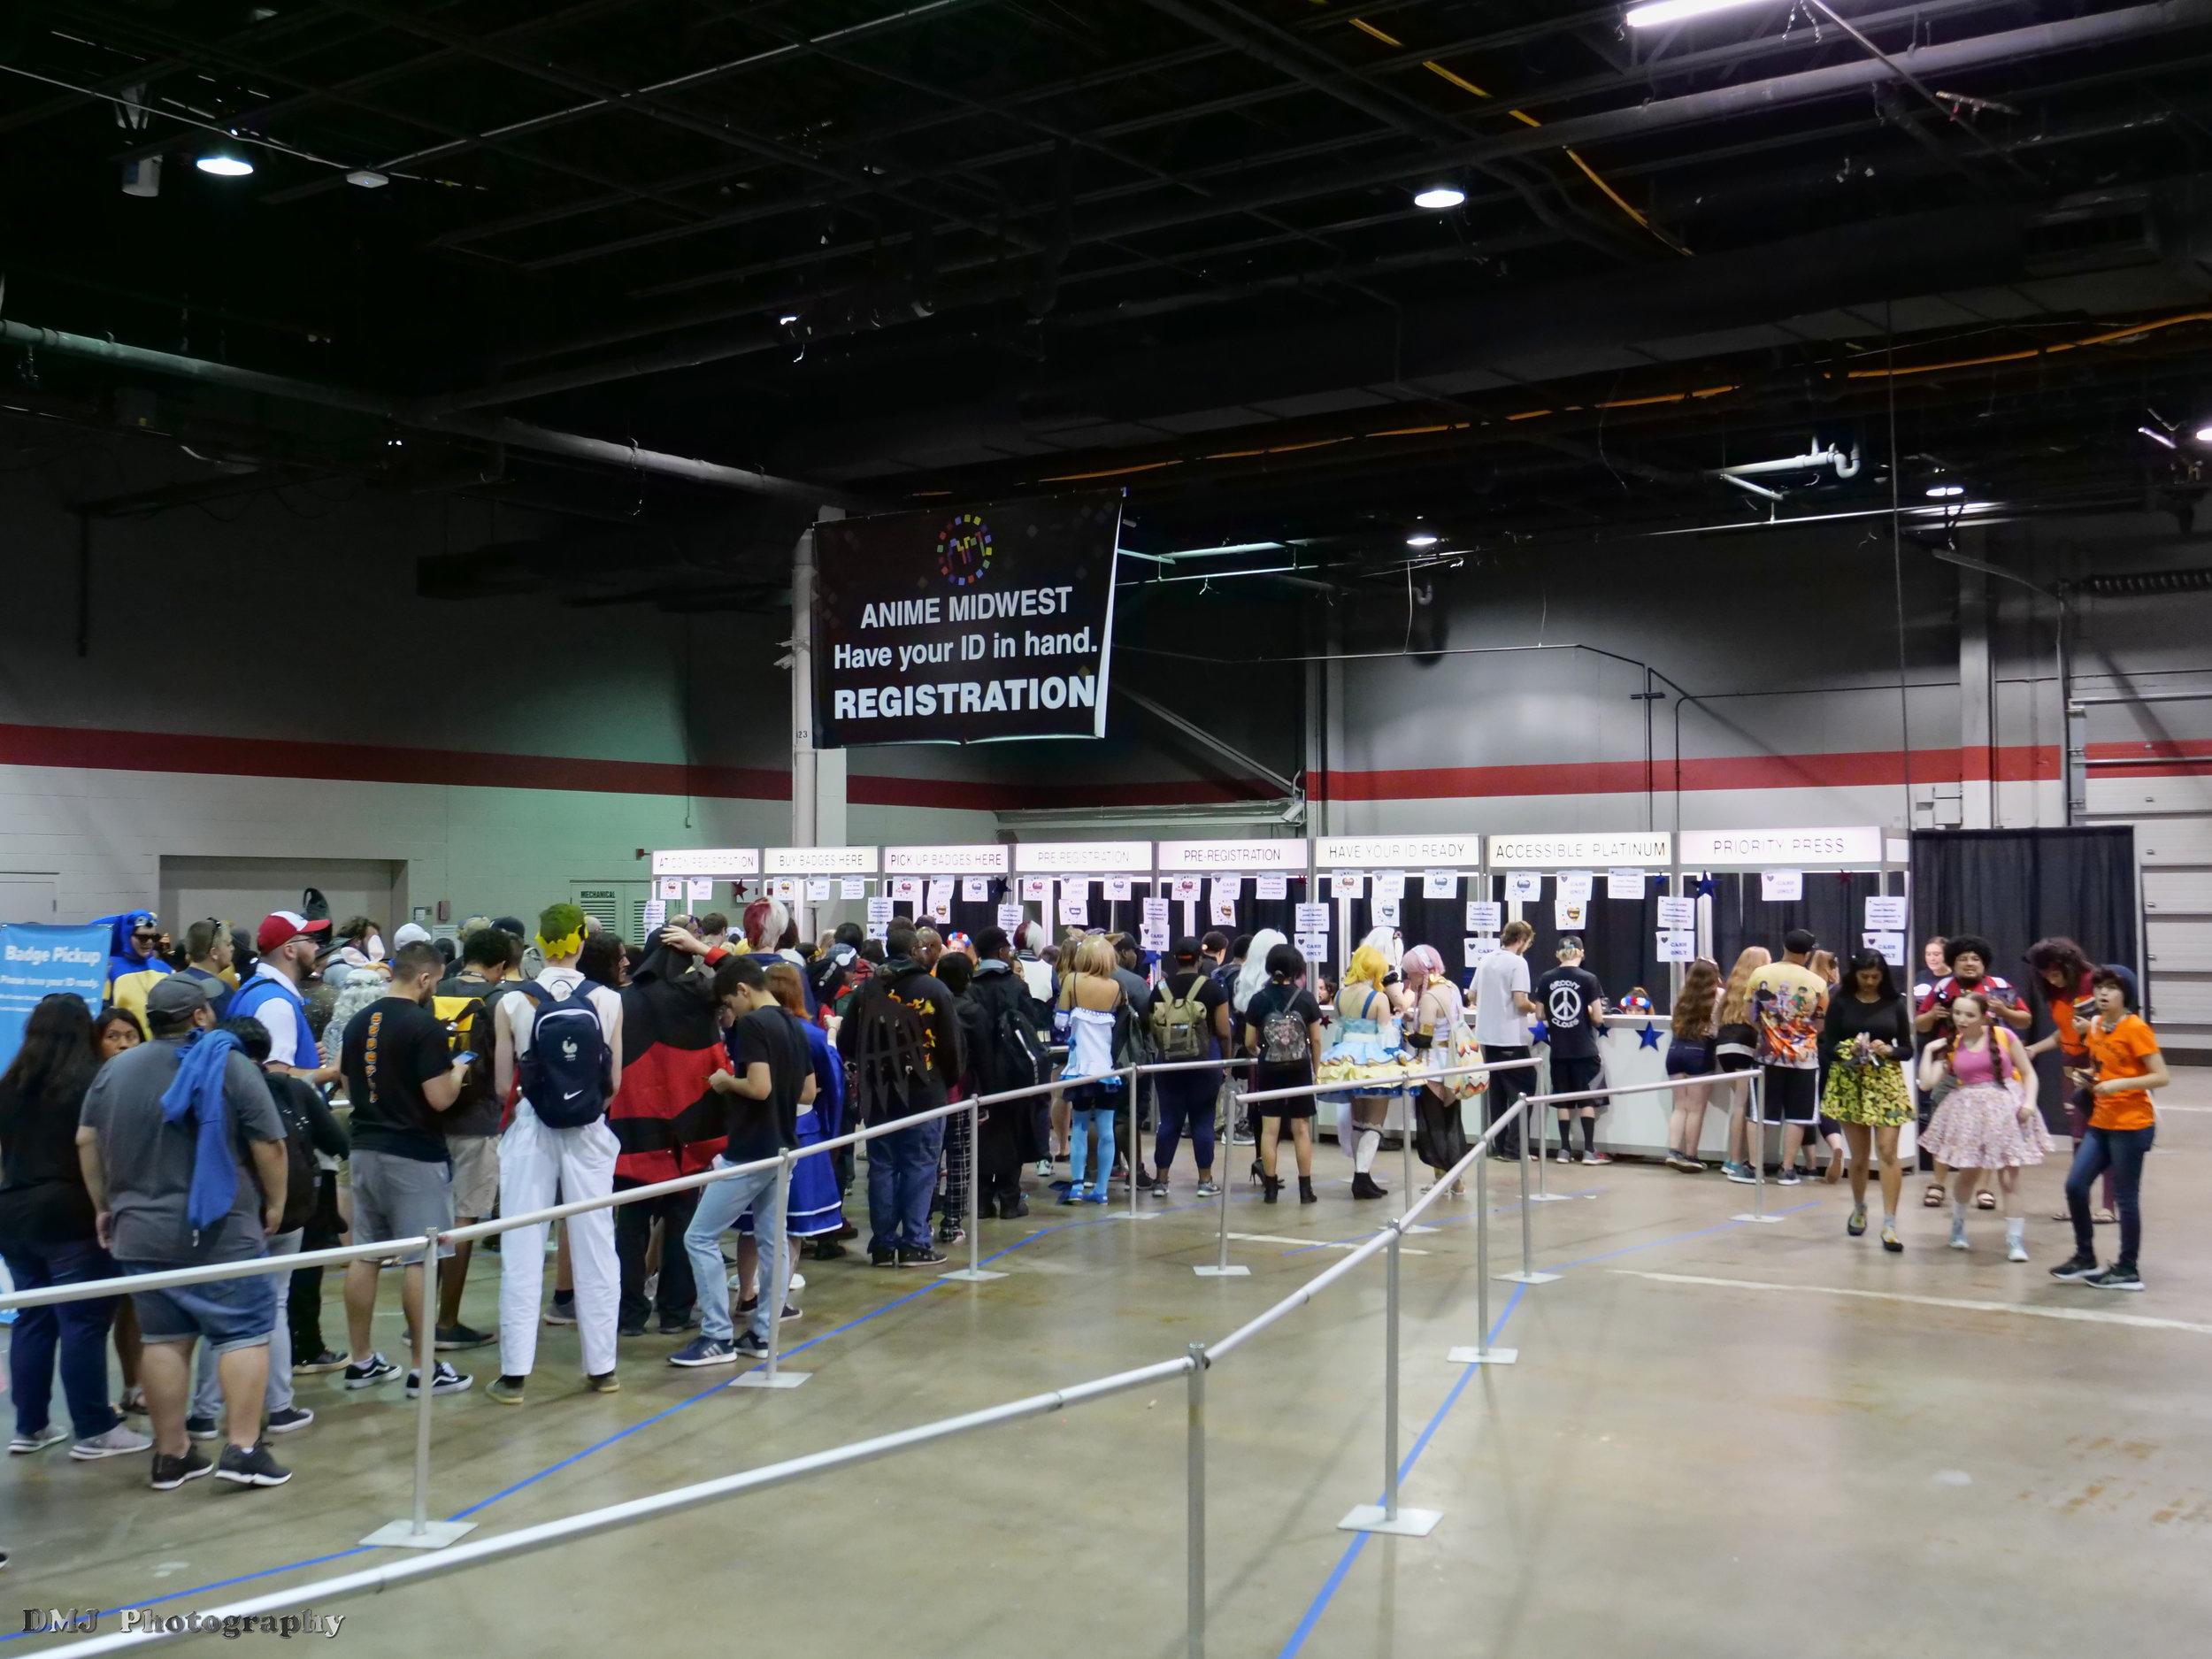 Registration Booths